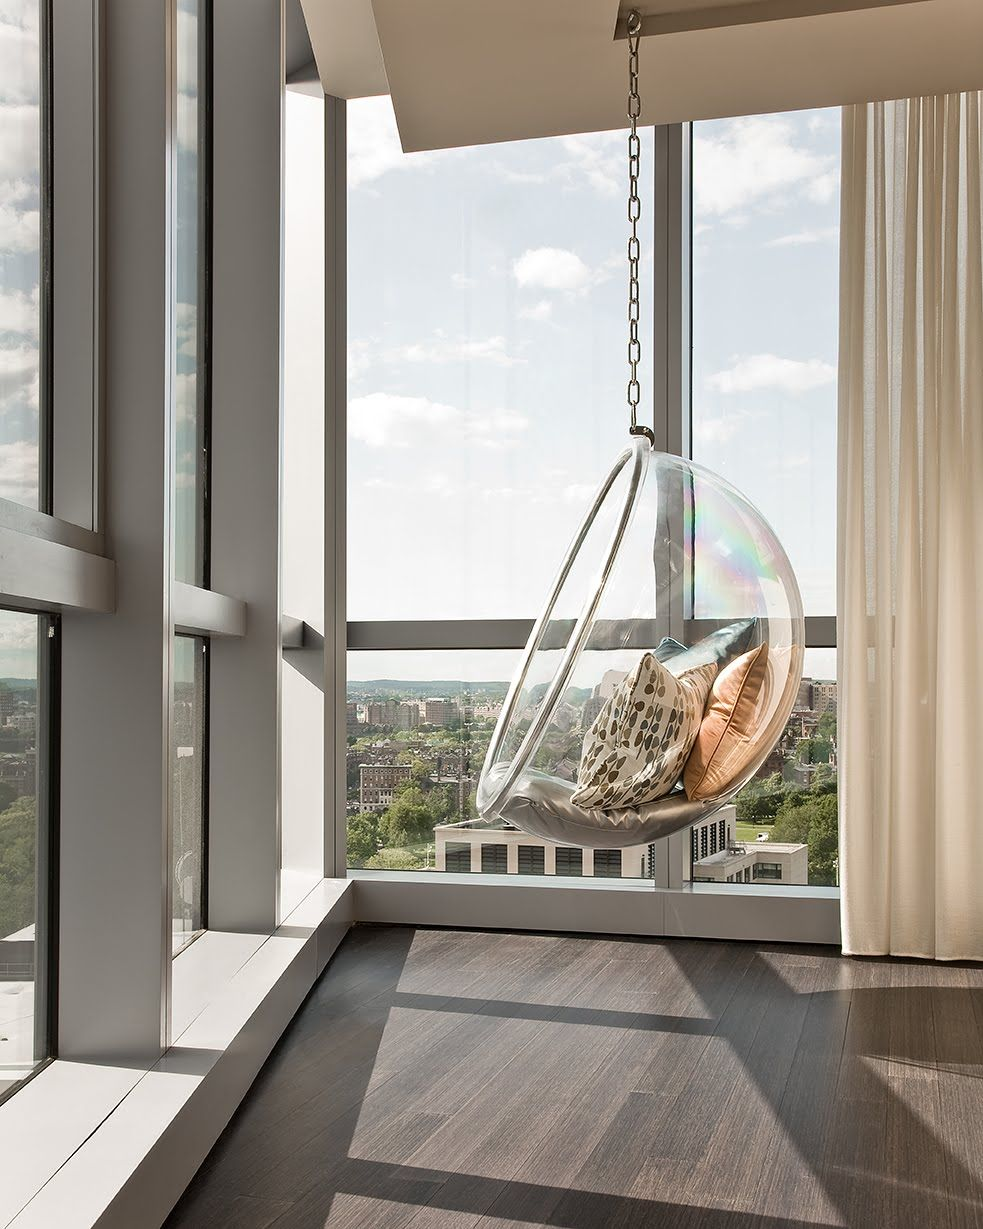 Bubble chair, The W Hotel, Boston | Happy Entry | Pinterest | Bubble ...